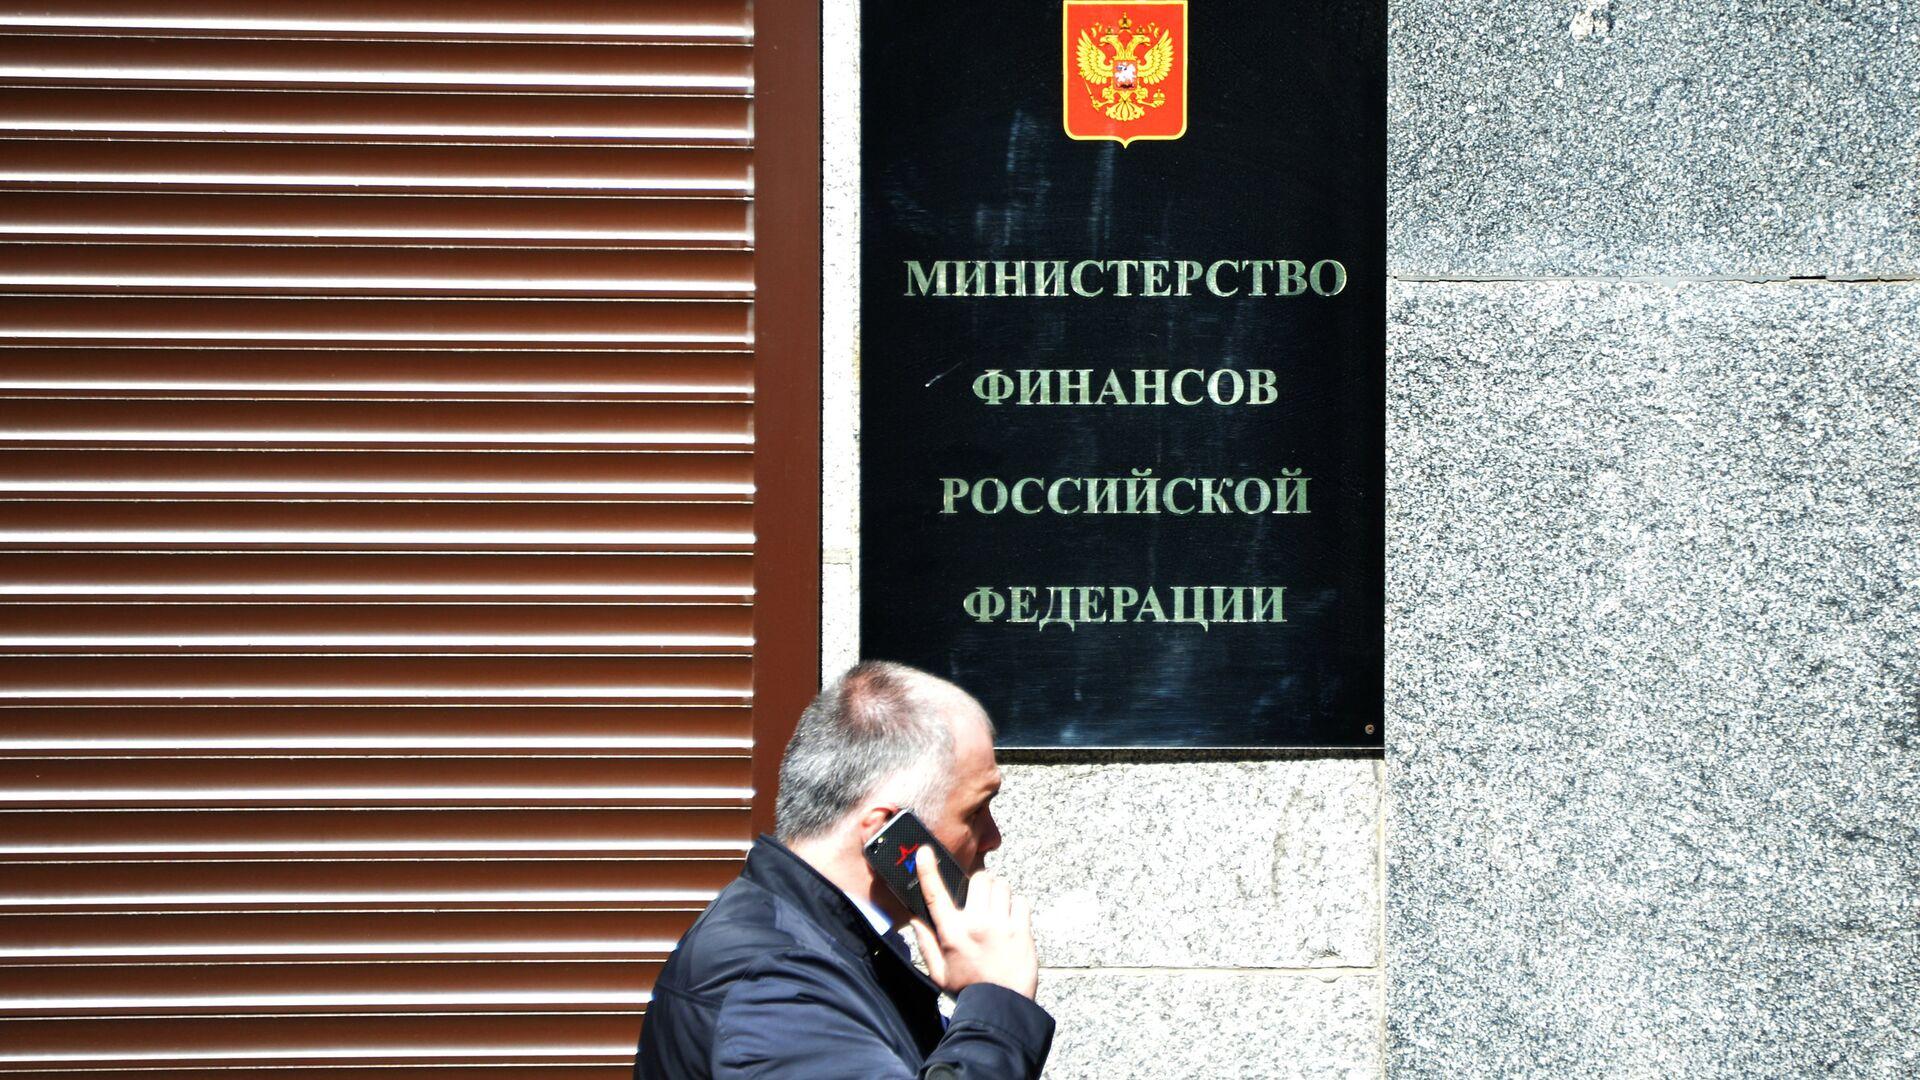 Министерство финансов РФ - РИА Новости, 1920, 13.09.2021